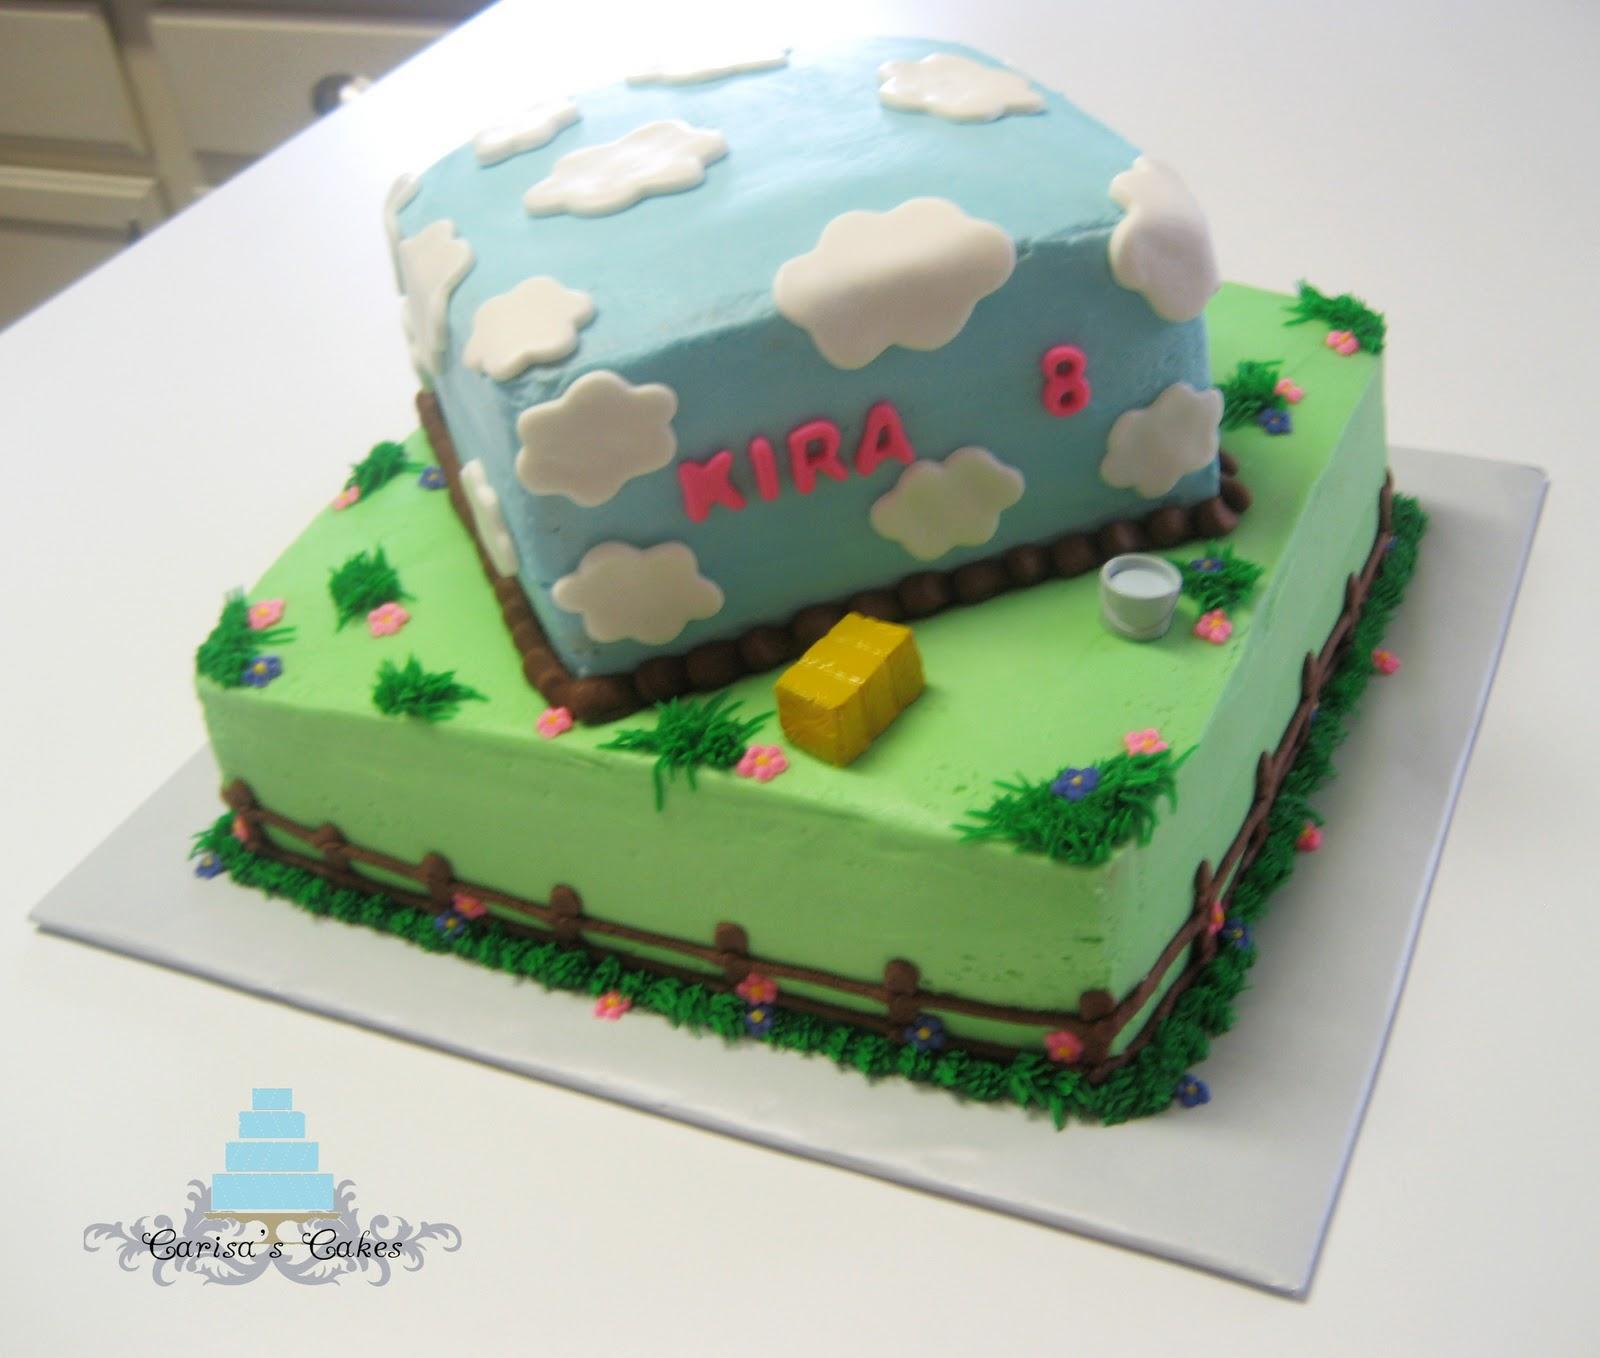 Themed Cake For Birthday : Carisa s Cakes: Horse Themed Birthday Cake